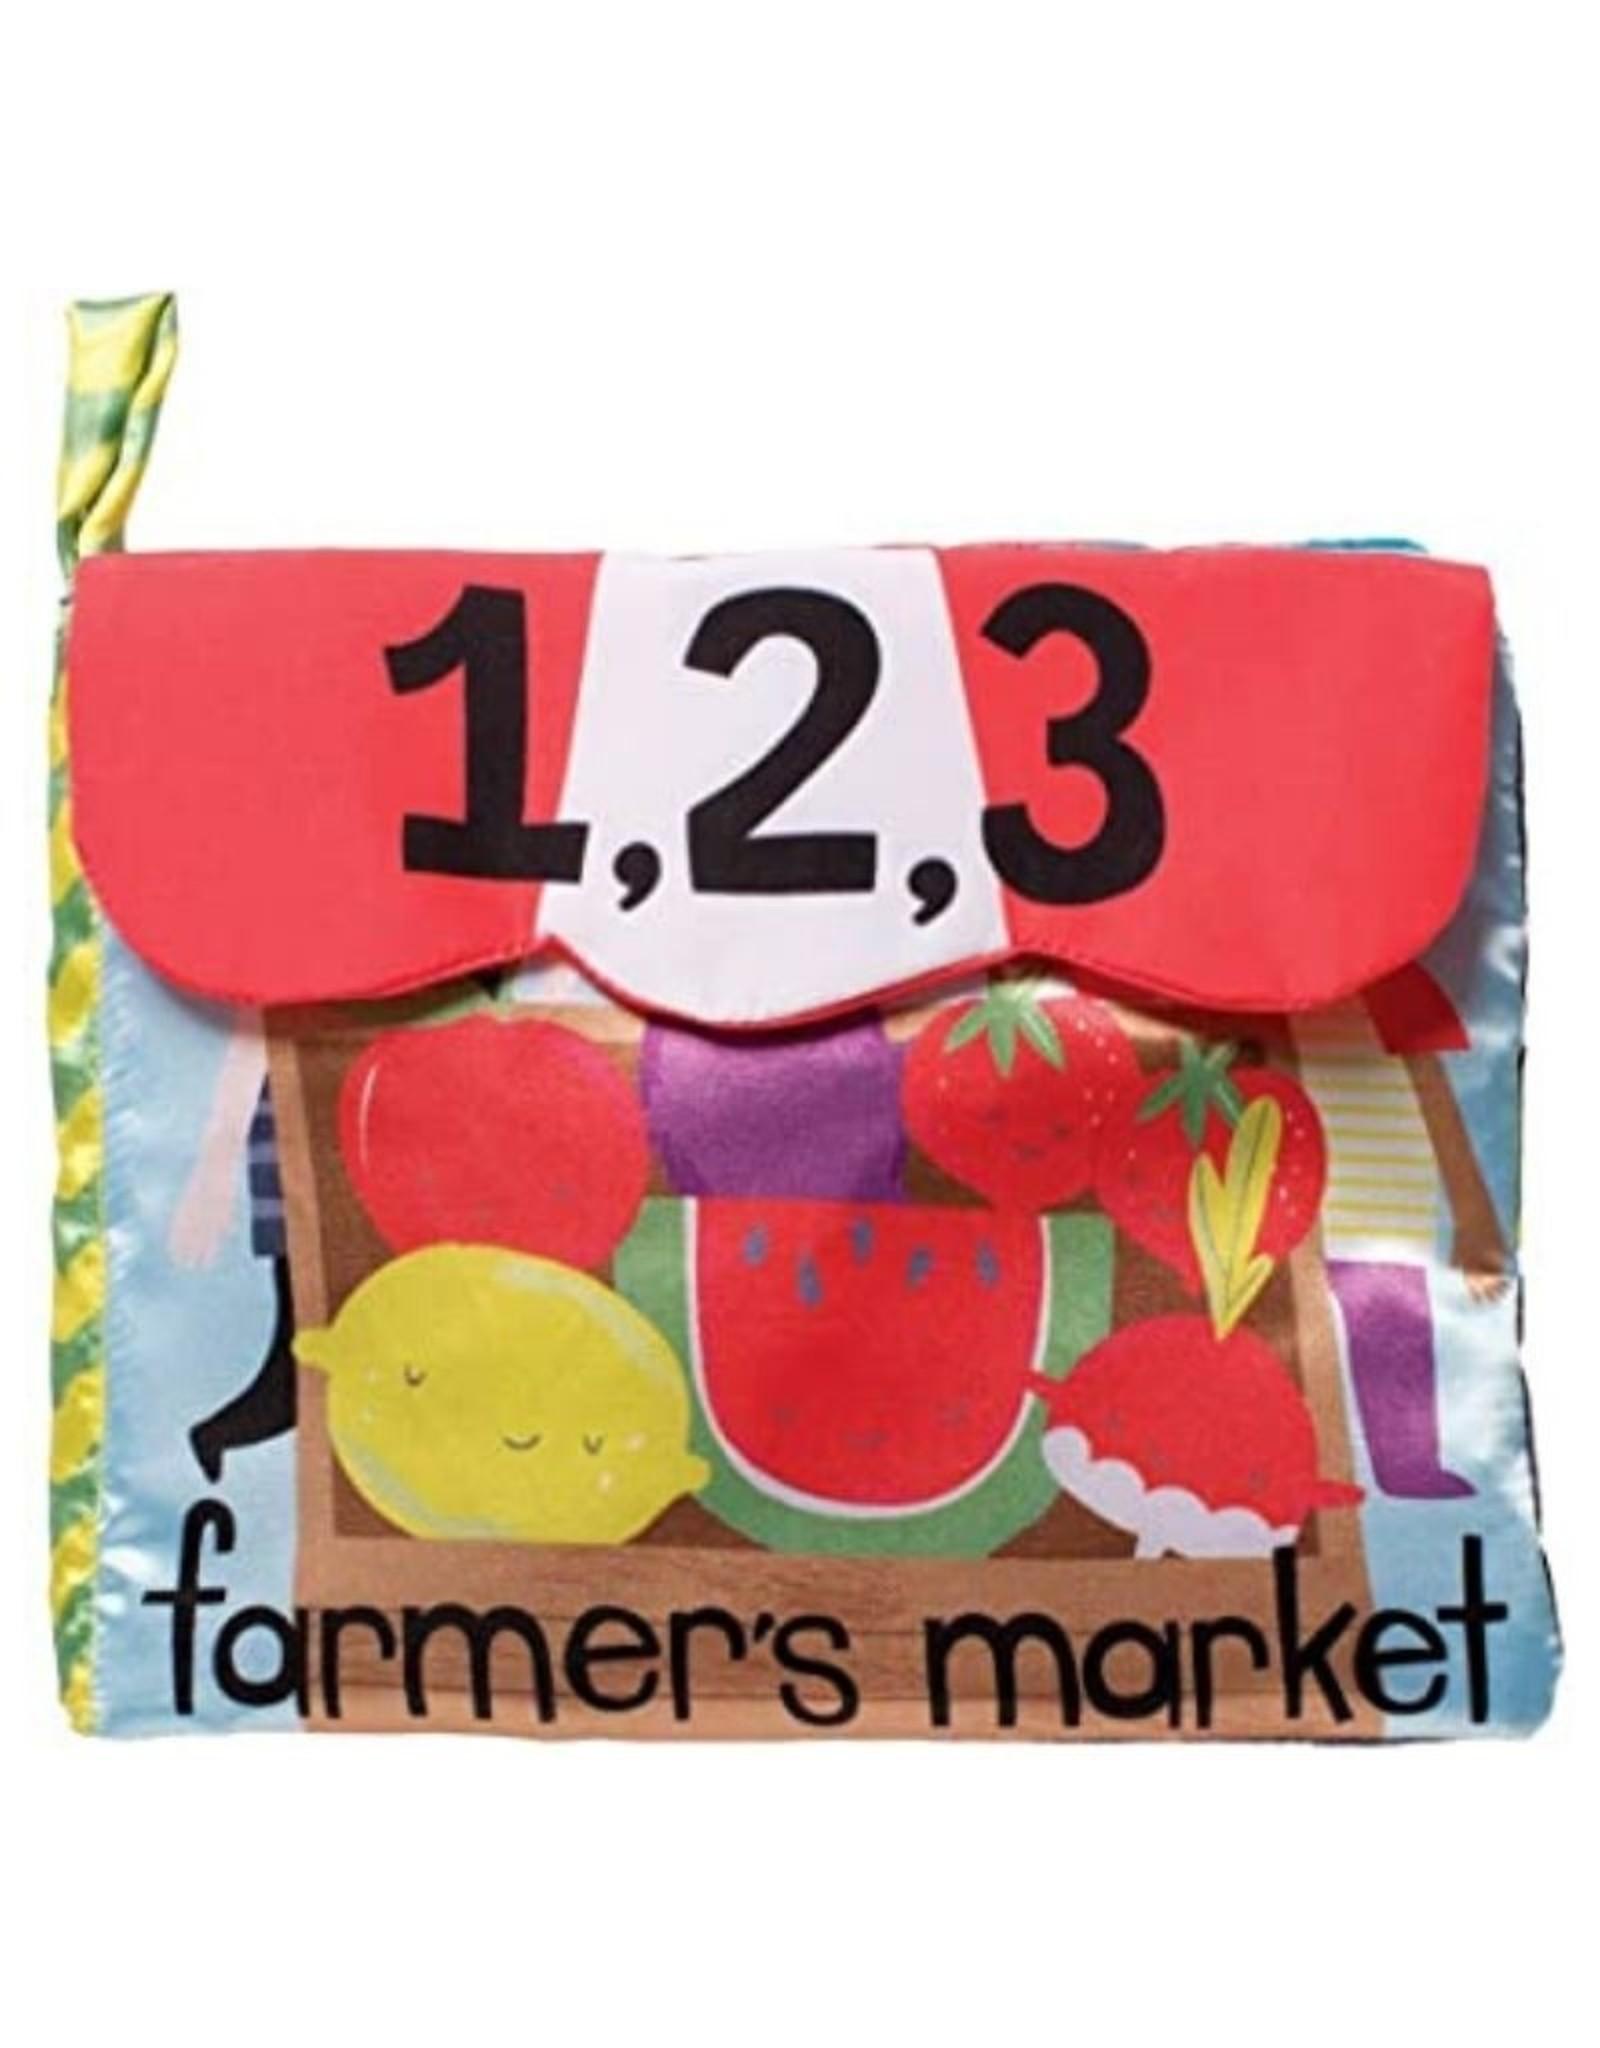 Farmer's Market Book